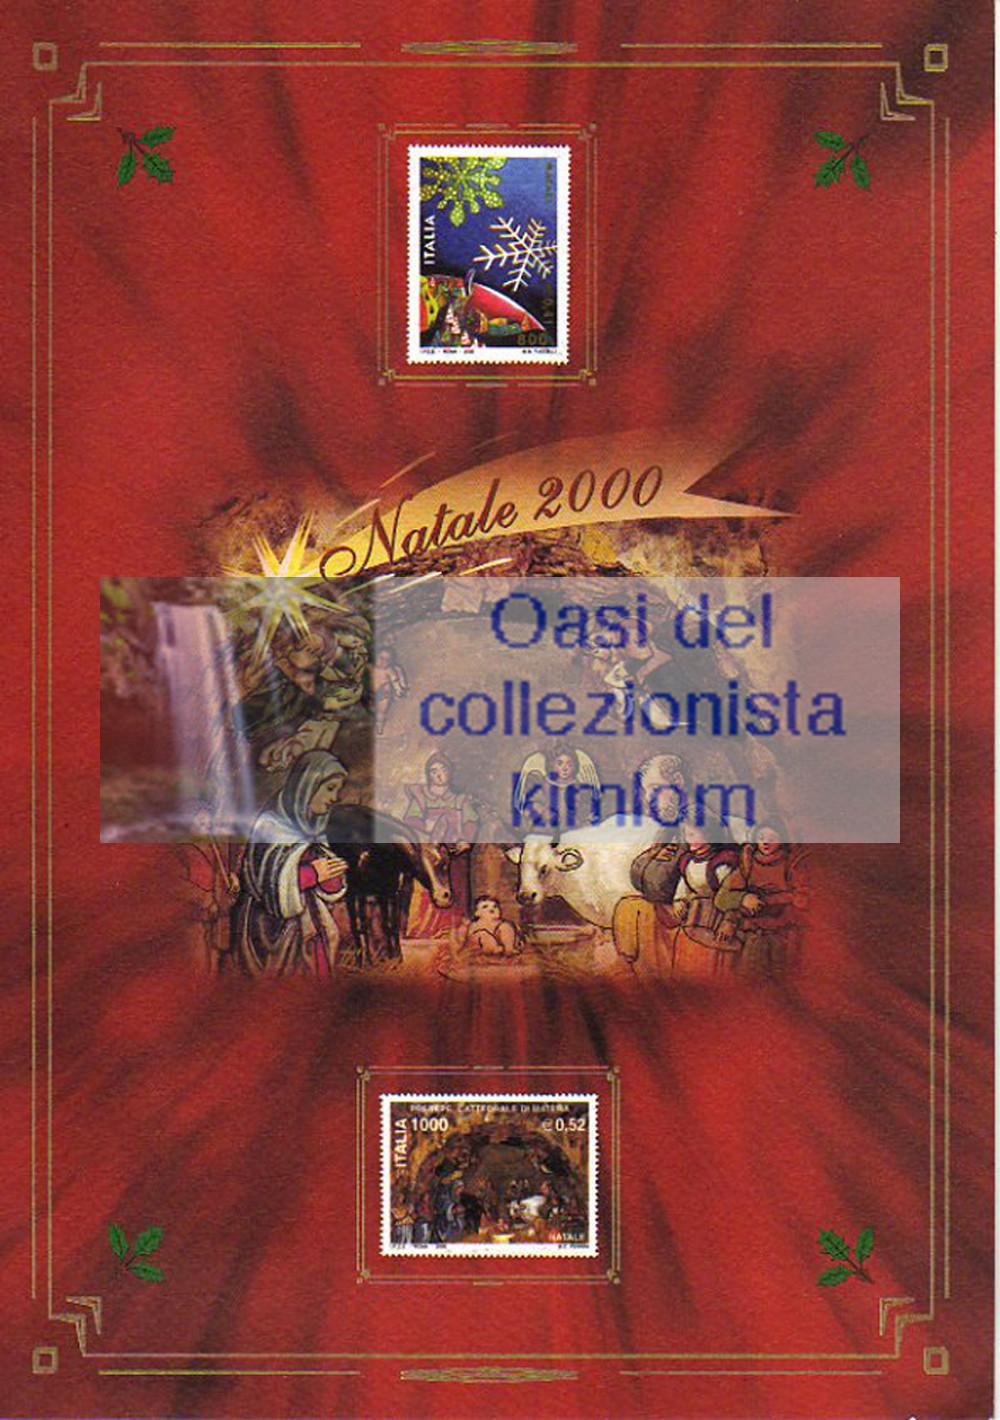 folder - Natale 2000